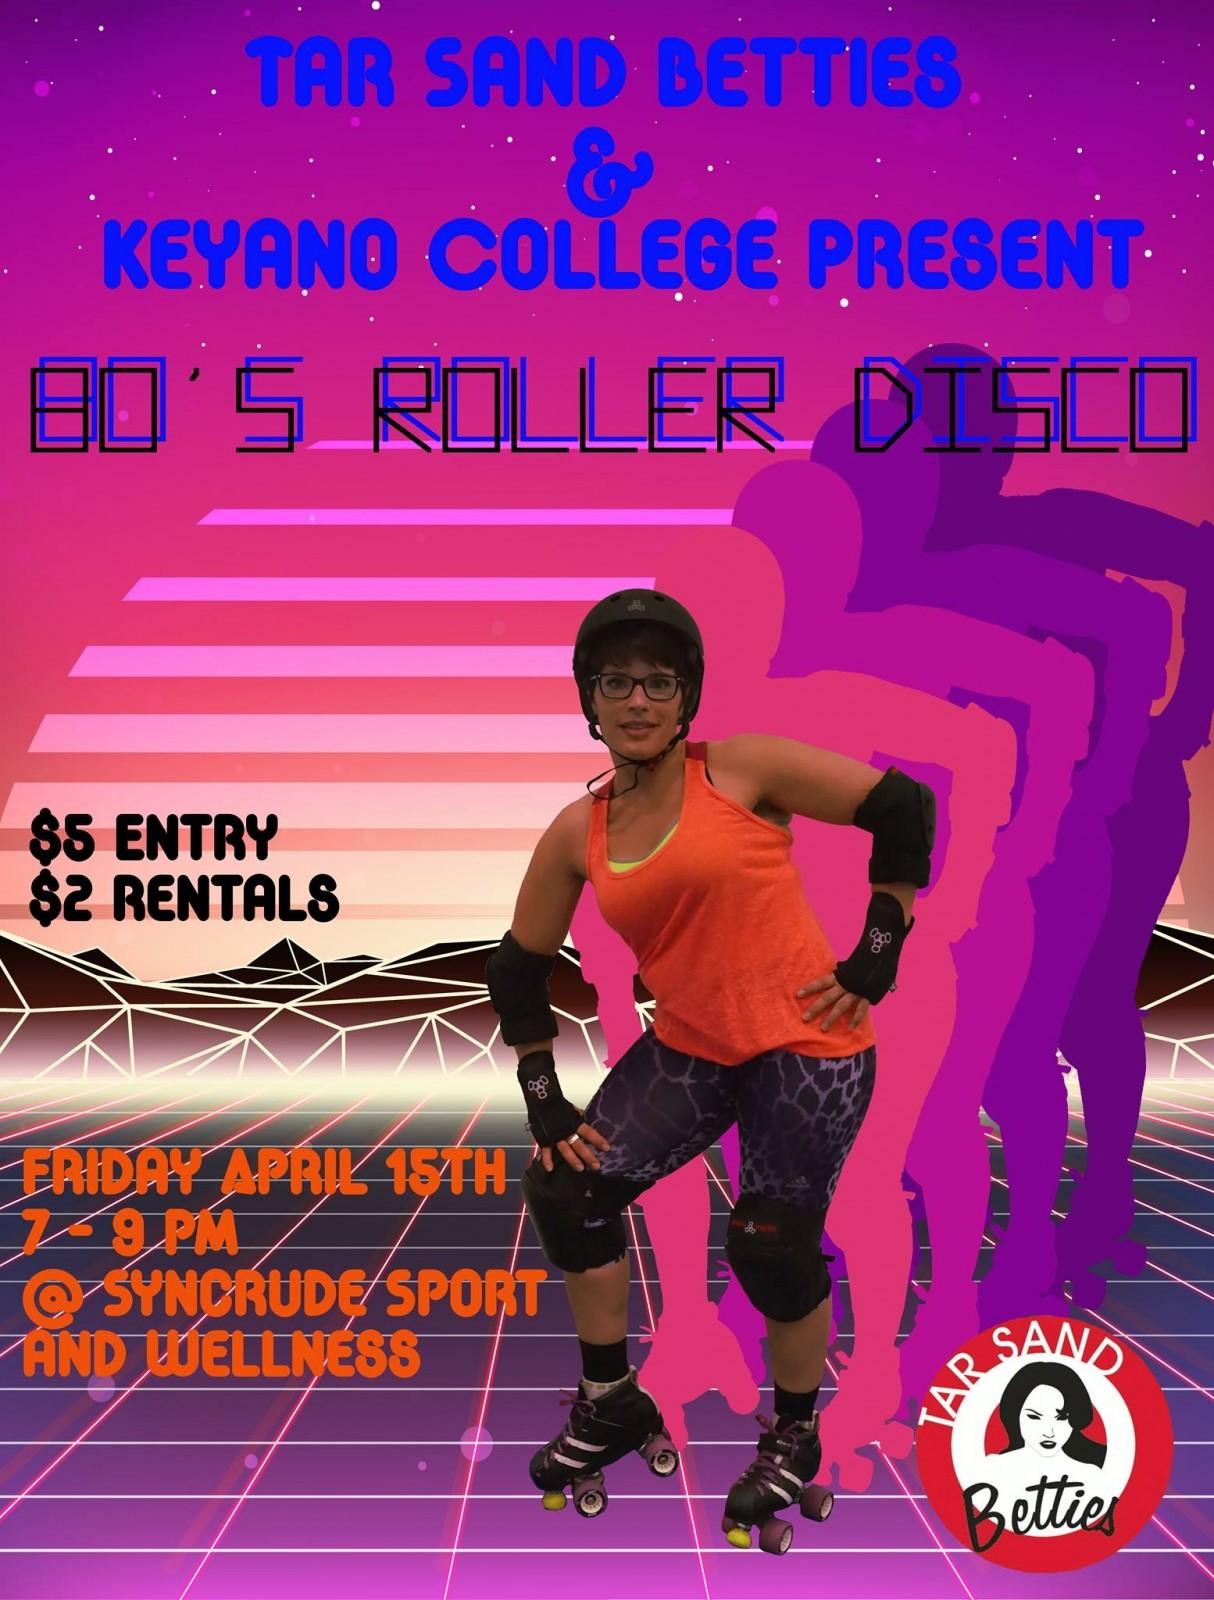 Tar Sand Betties host Roller Disco Friday